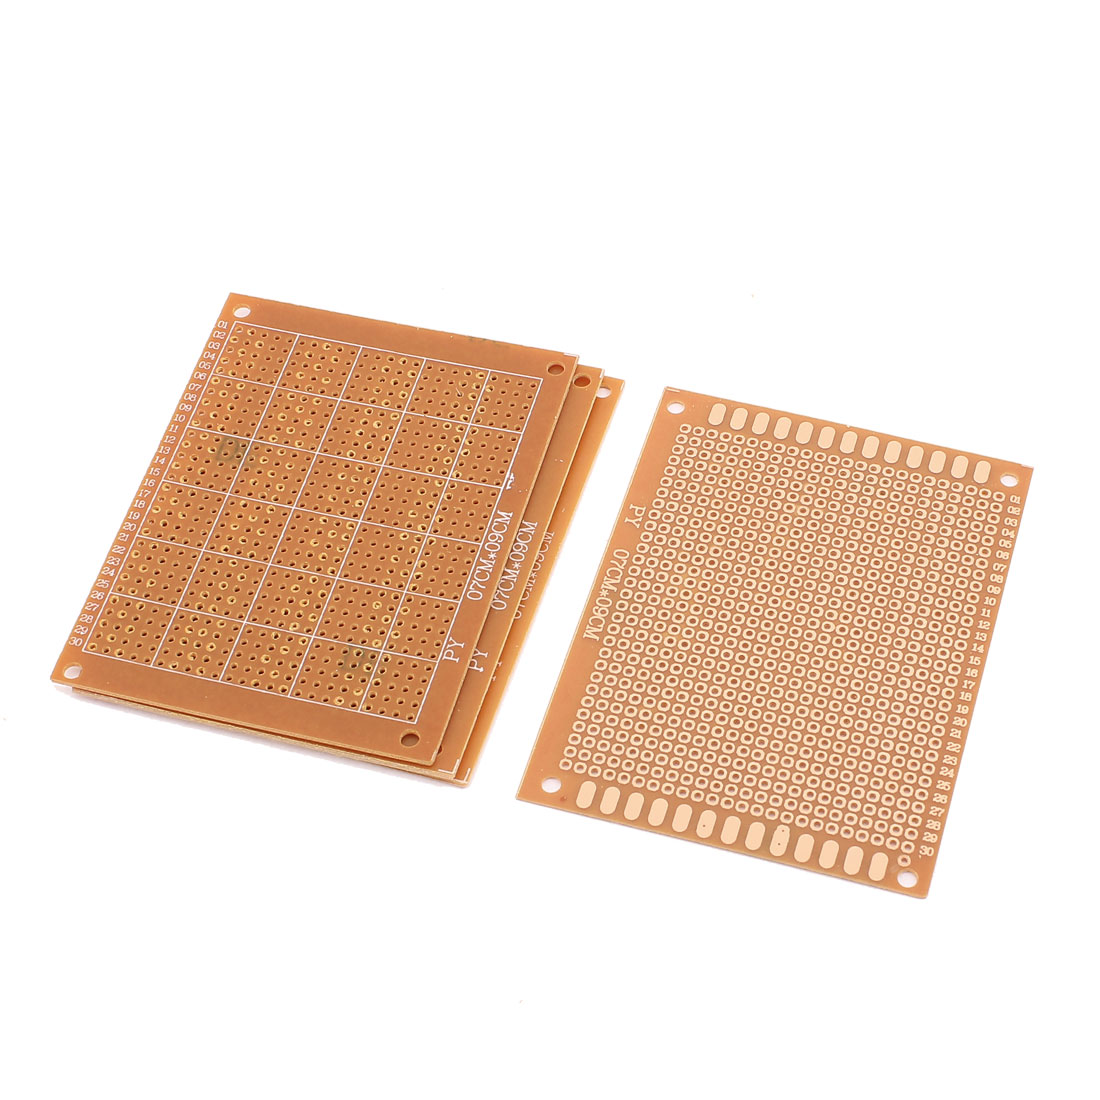 4Pcs 9 x 7cm Single-Side Prototype PCB Panel Universal Matrix Circuit Board